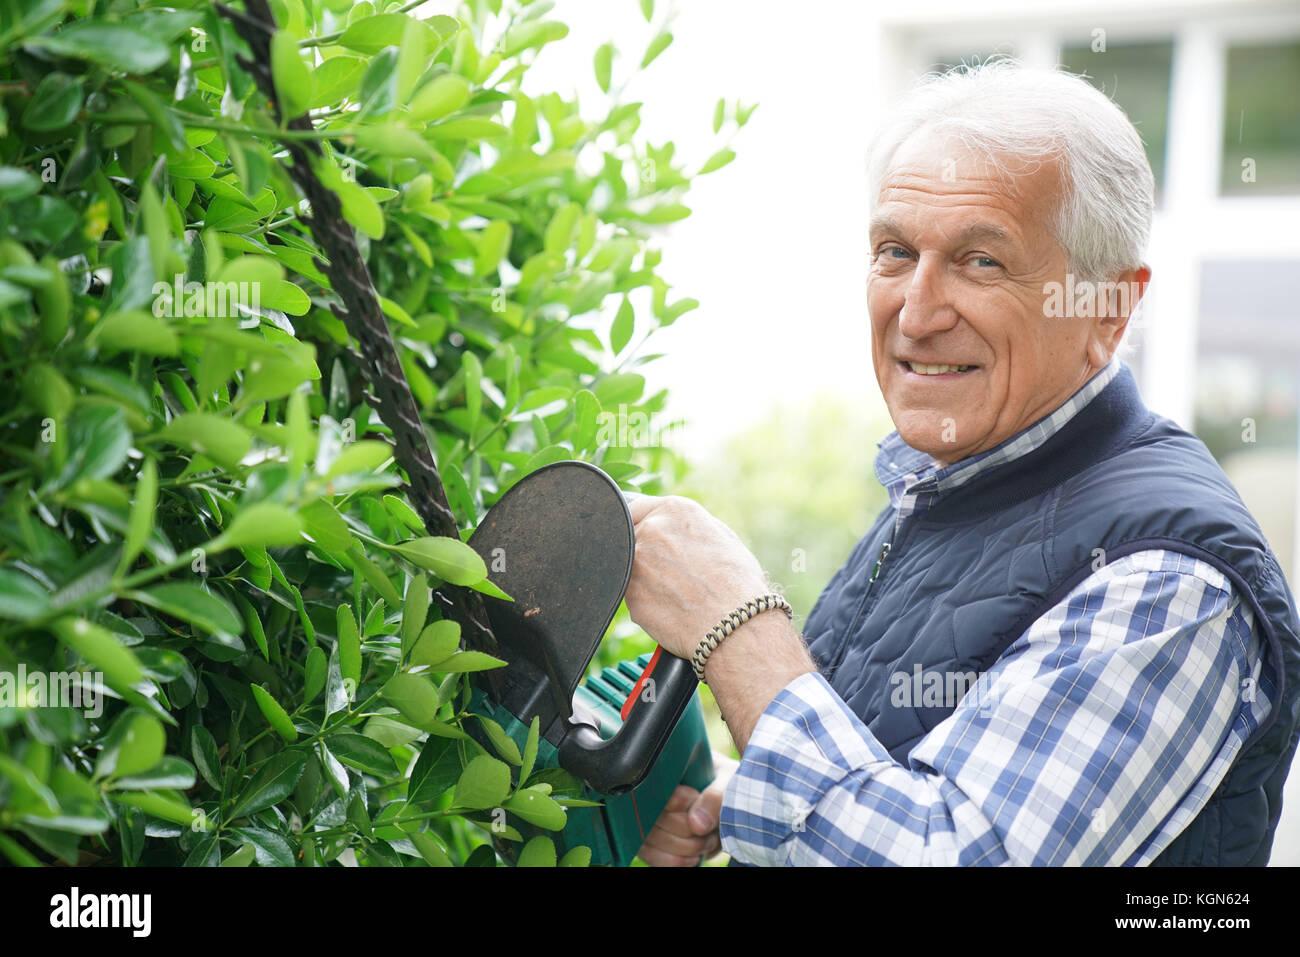 Senior man using hedge trimmer Stock Photo